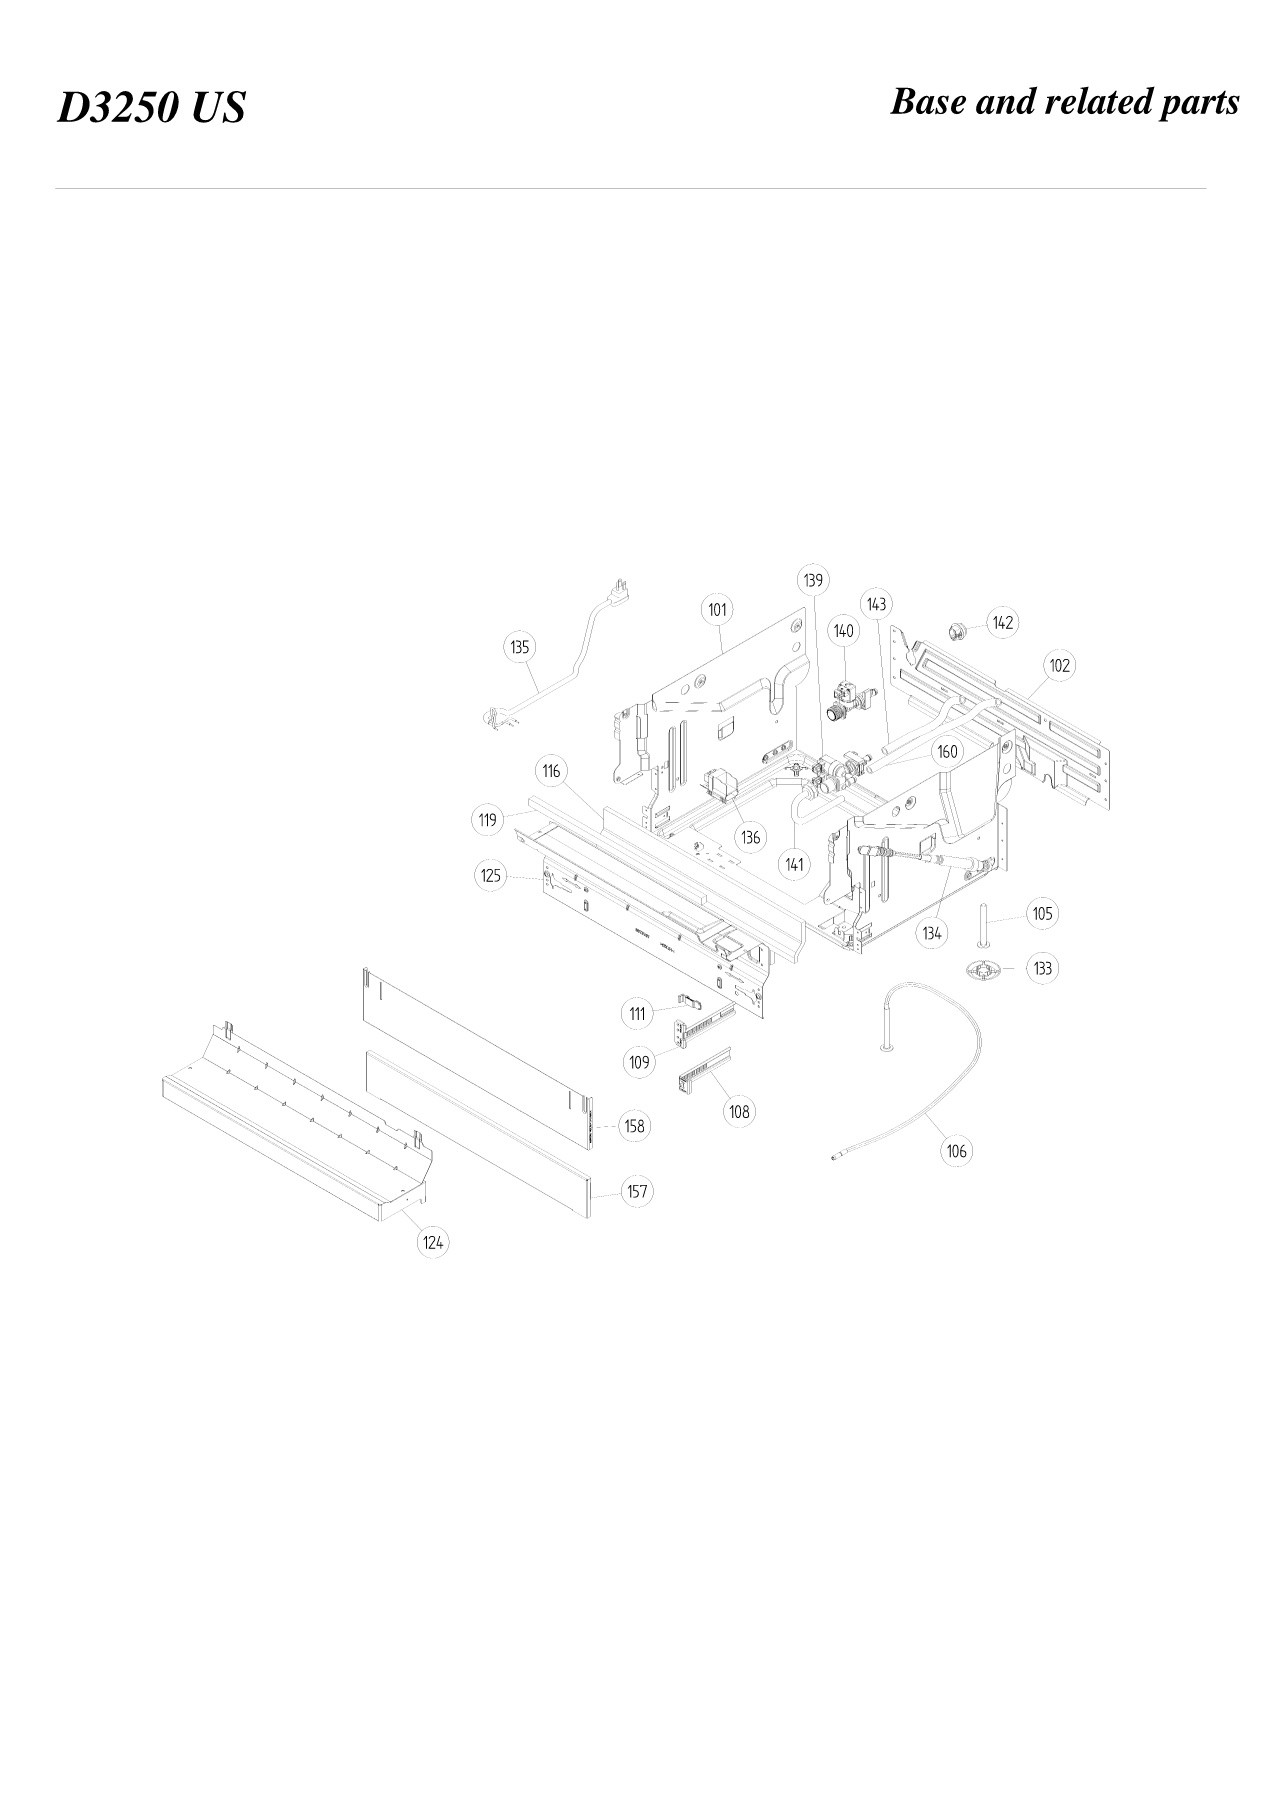 Asko Dishwasher Parts Diagram D3250 Dw20 3 Gr Fi Rev A Pages 1 15 Text Version Of Asko Dishwasher Parts Diagram